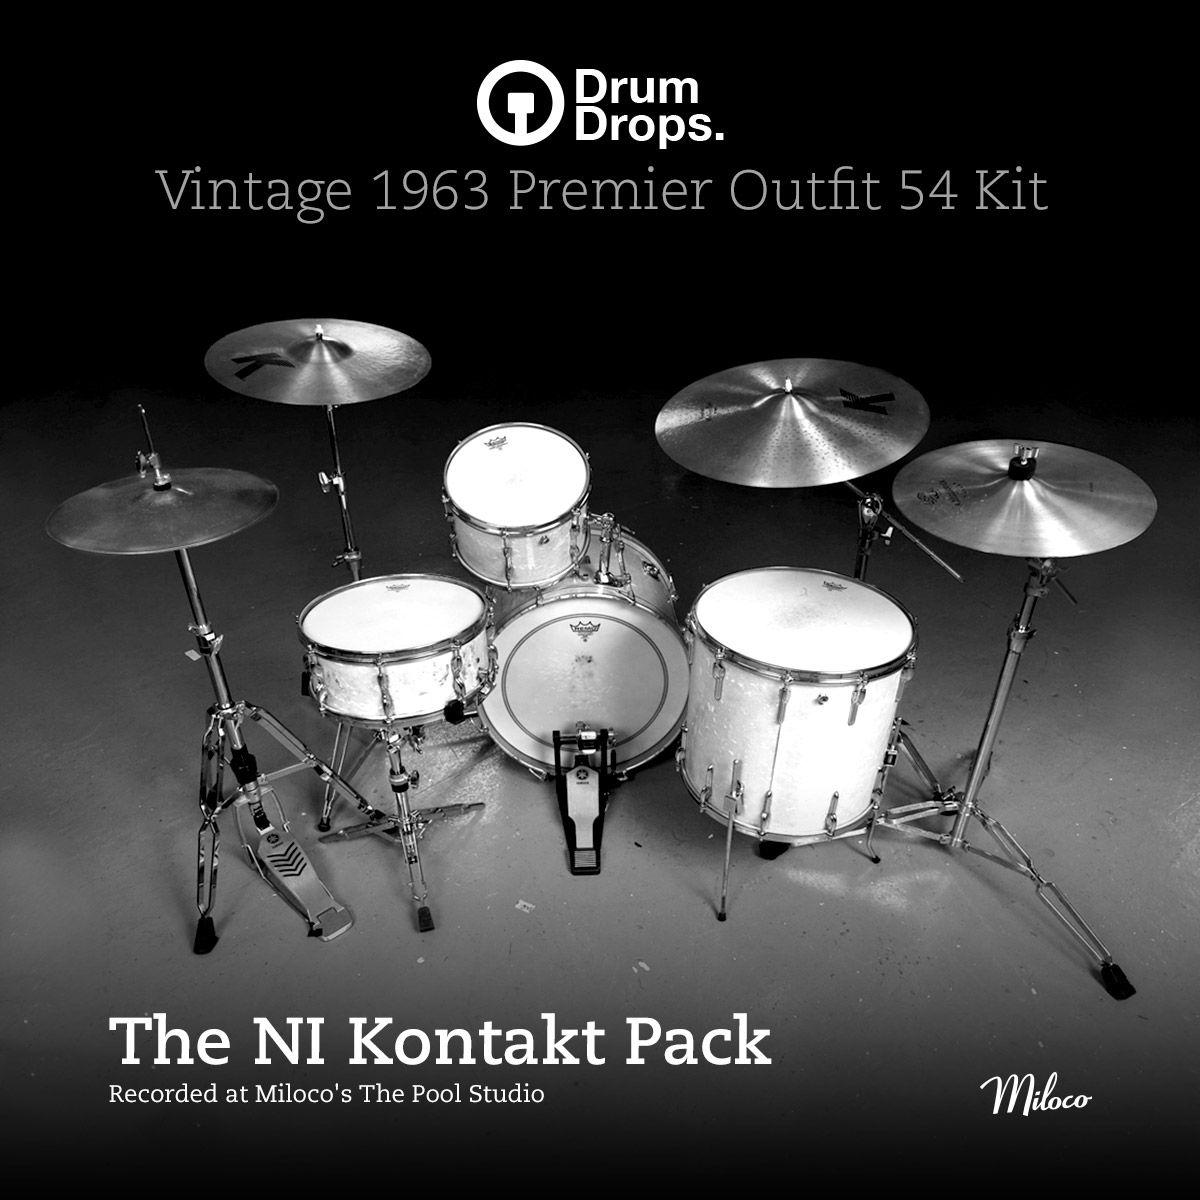 The Premier Outfits 54 Kit Ki Kontakt 5 Sample Pack Http Drumdrops Com Drum Samples 1963 Premier Outfit 54 Drum Kit Page The Packs The Drums Kit Drum Kits